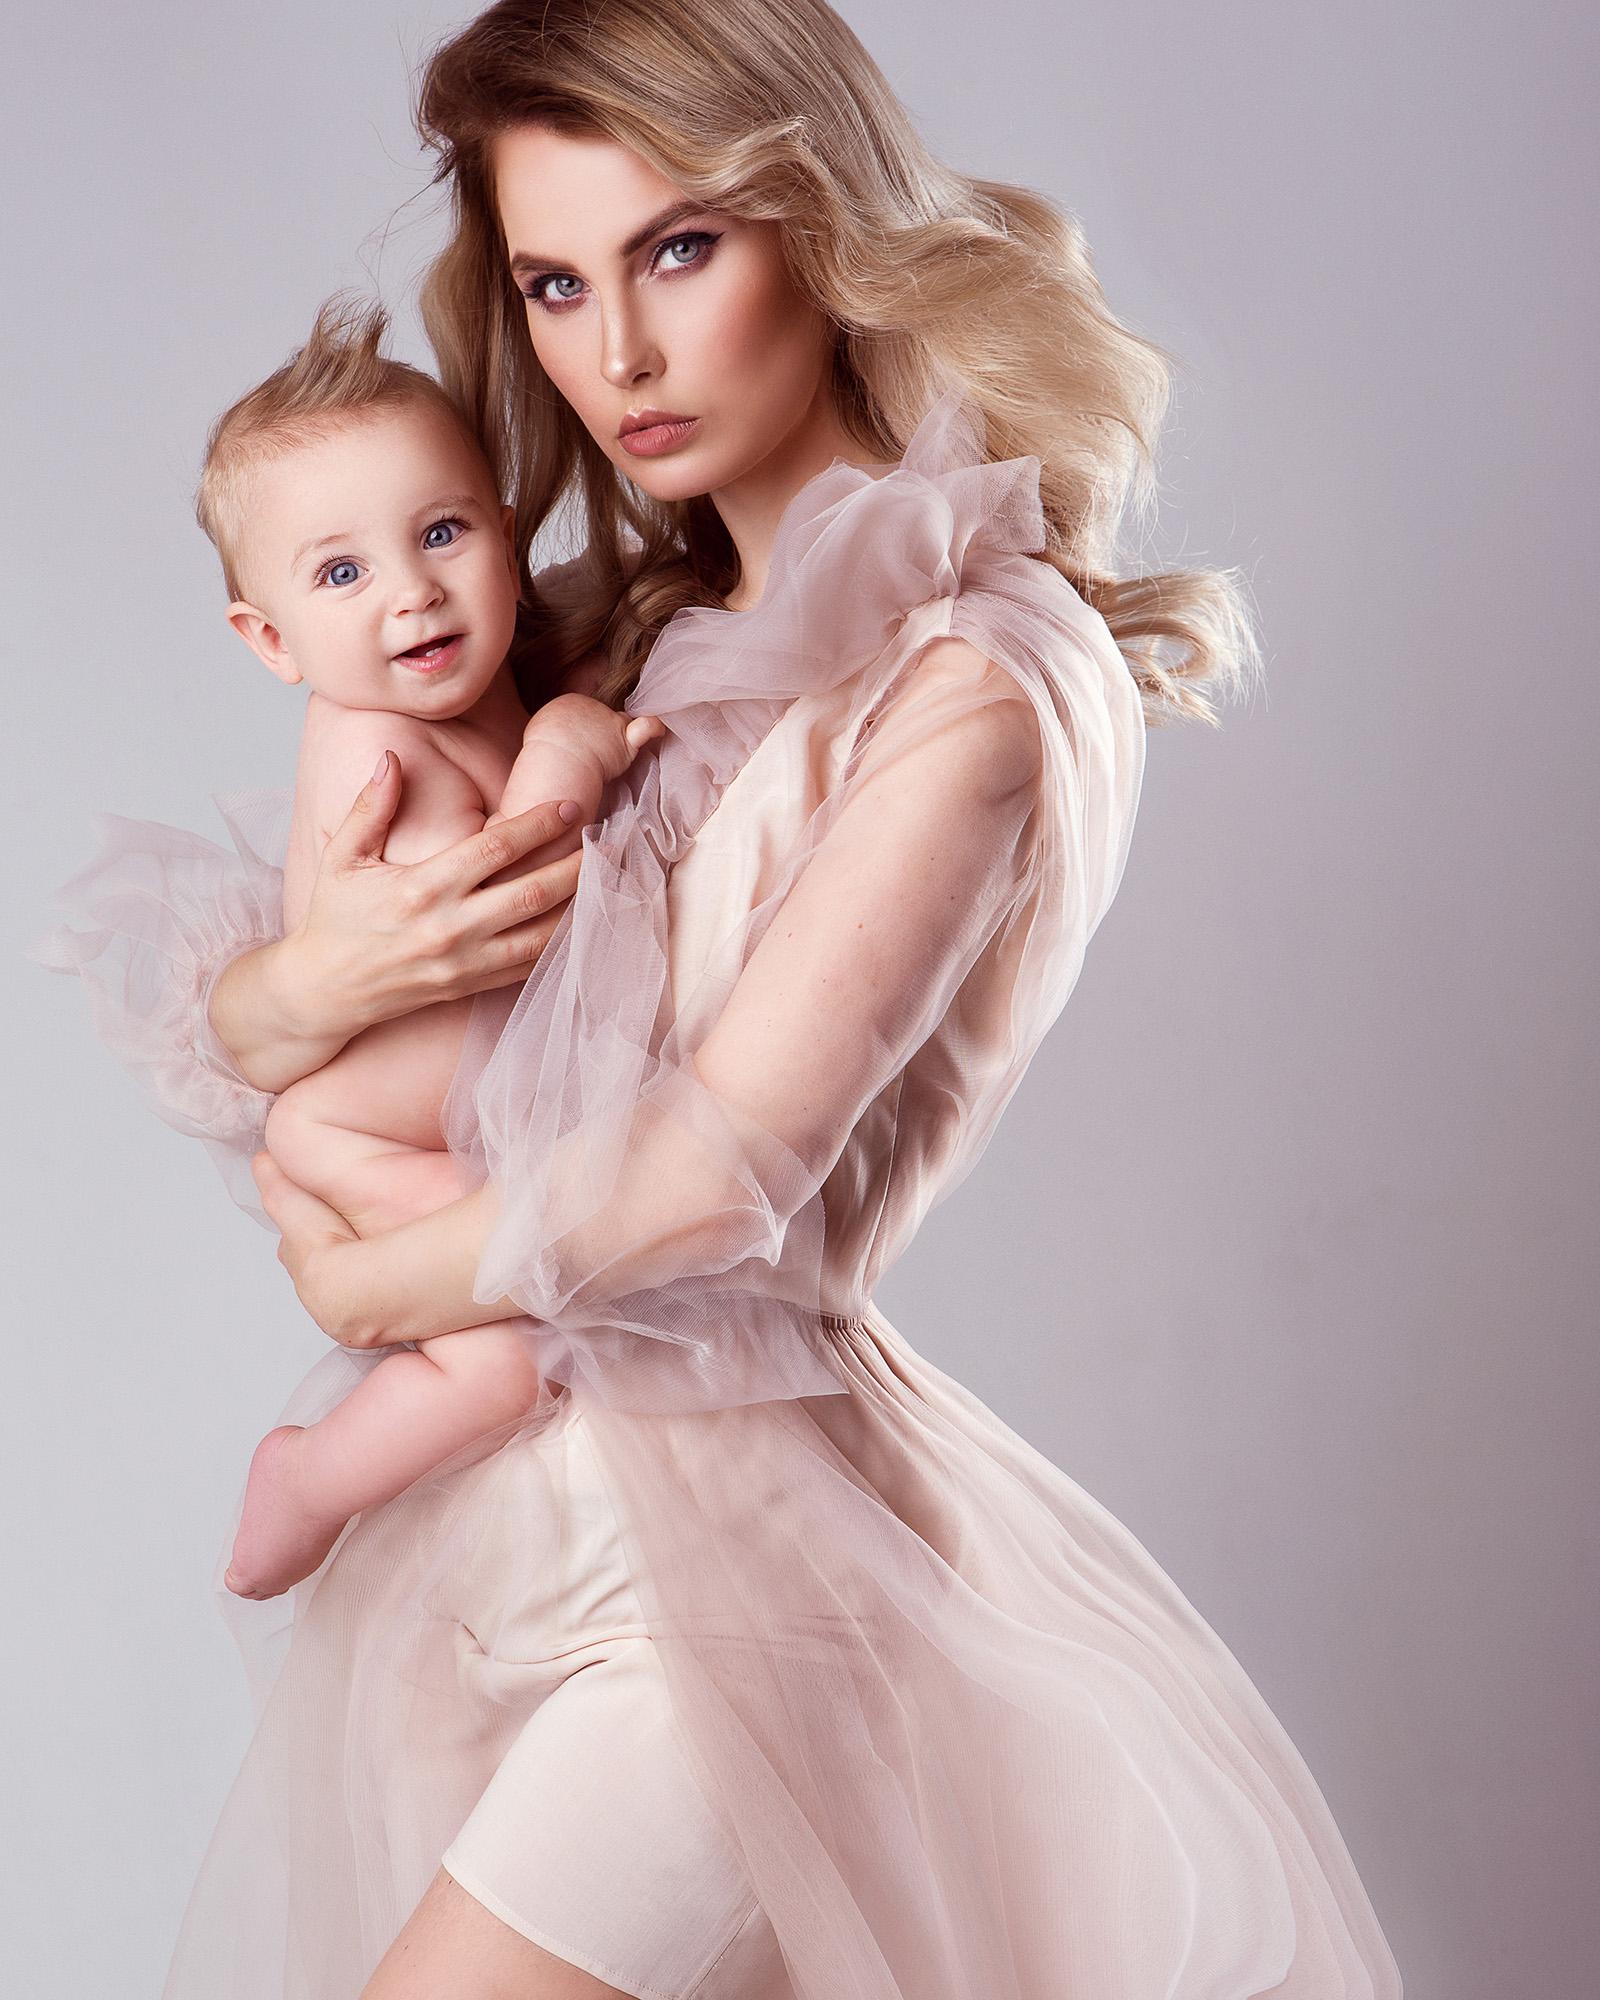 Mamma fashion negozi italia